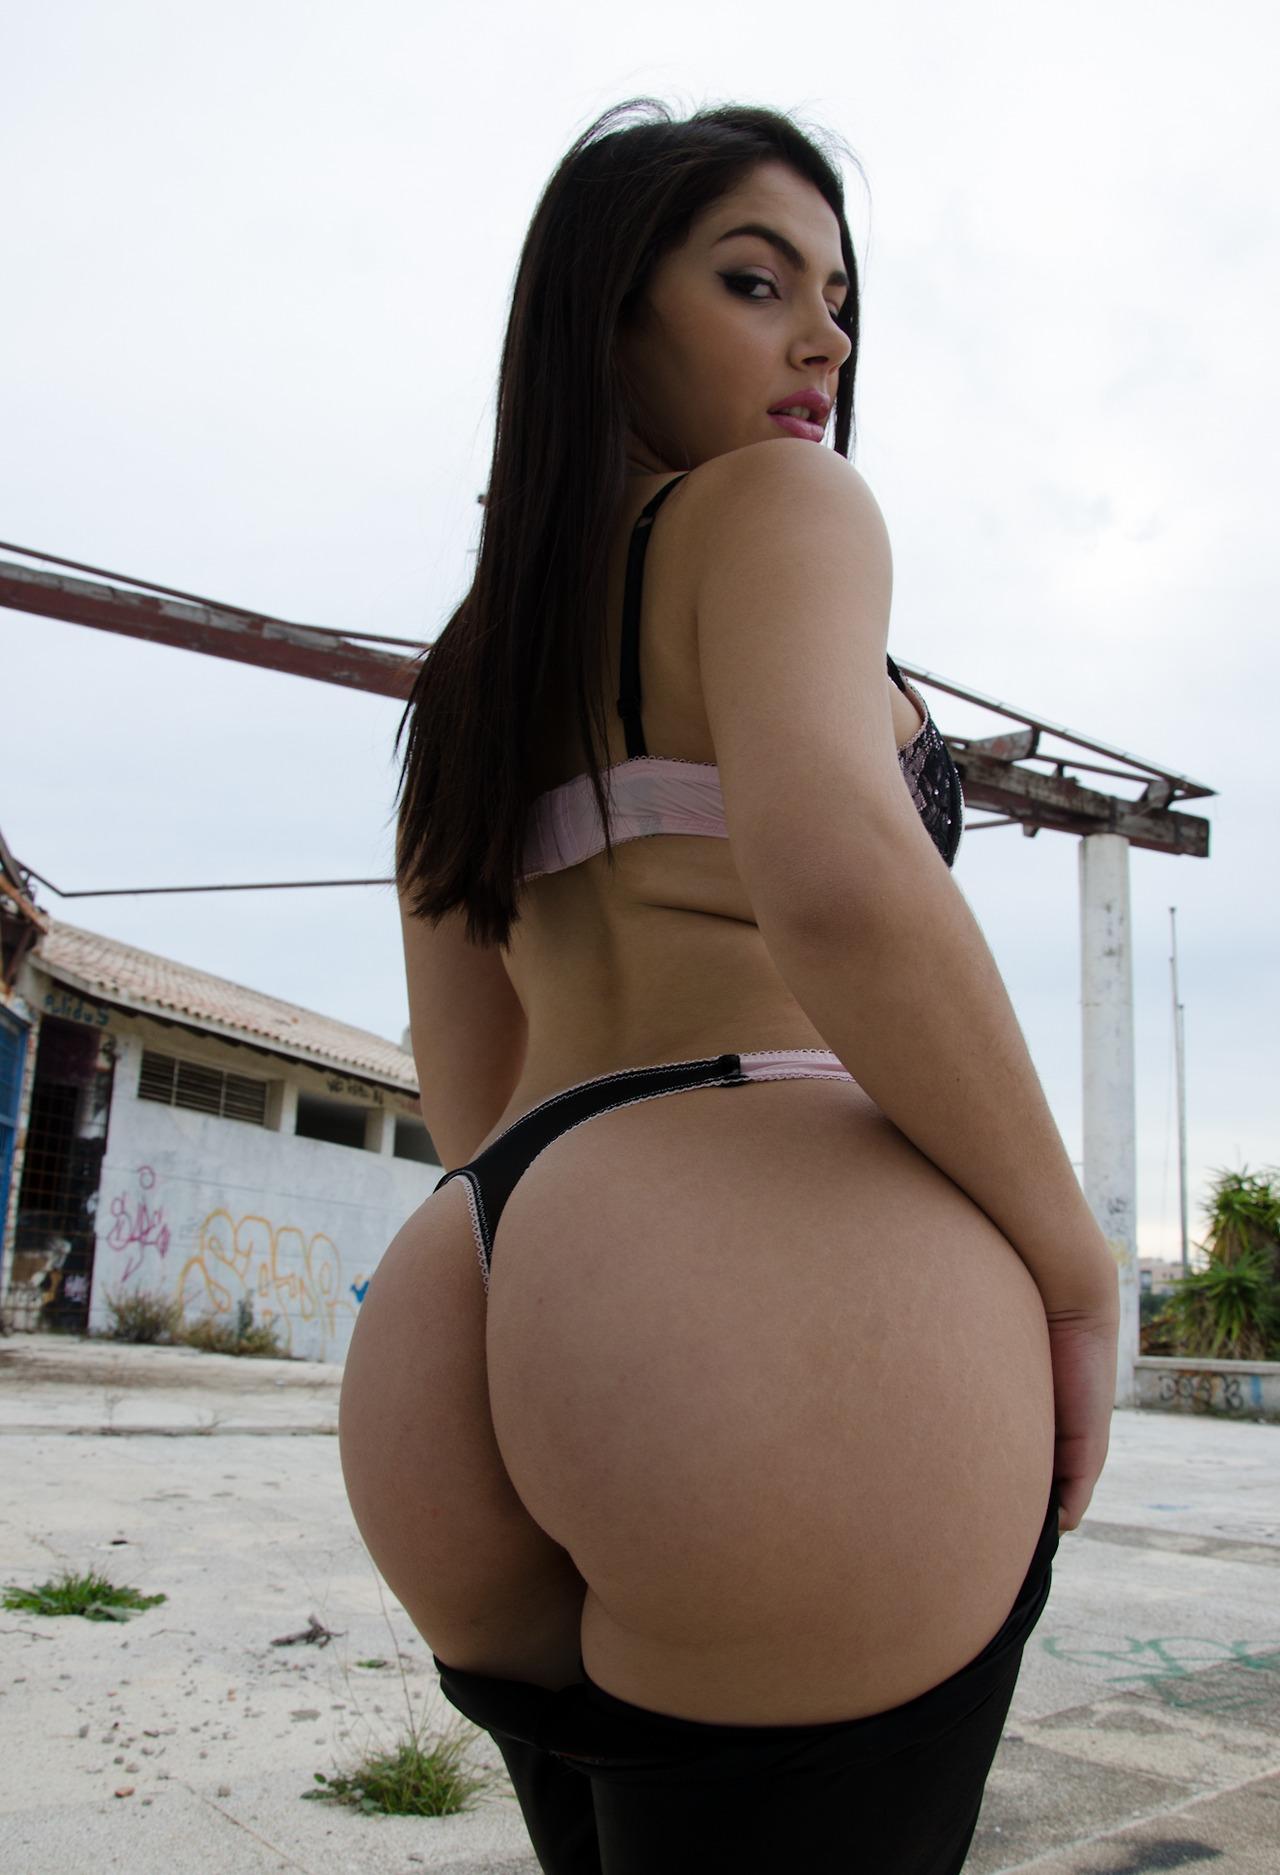 Amateur desnudas info latinas remember